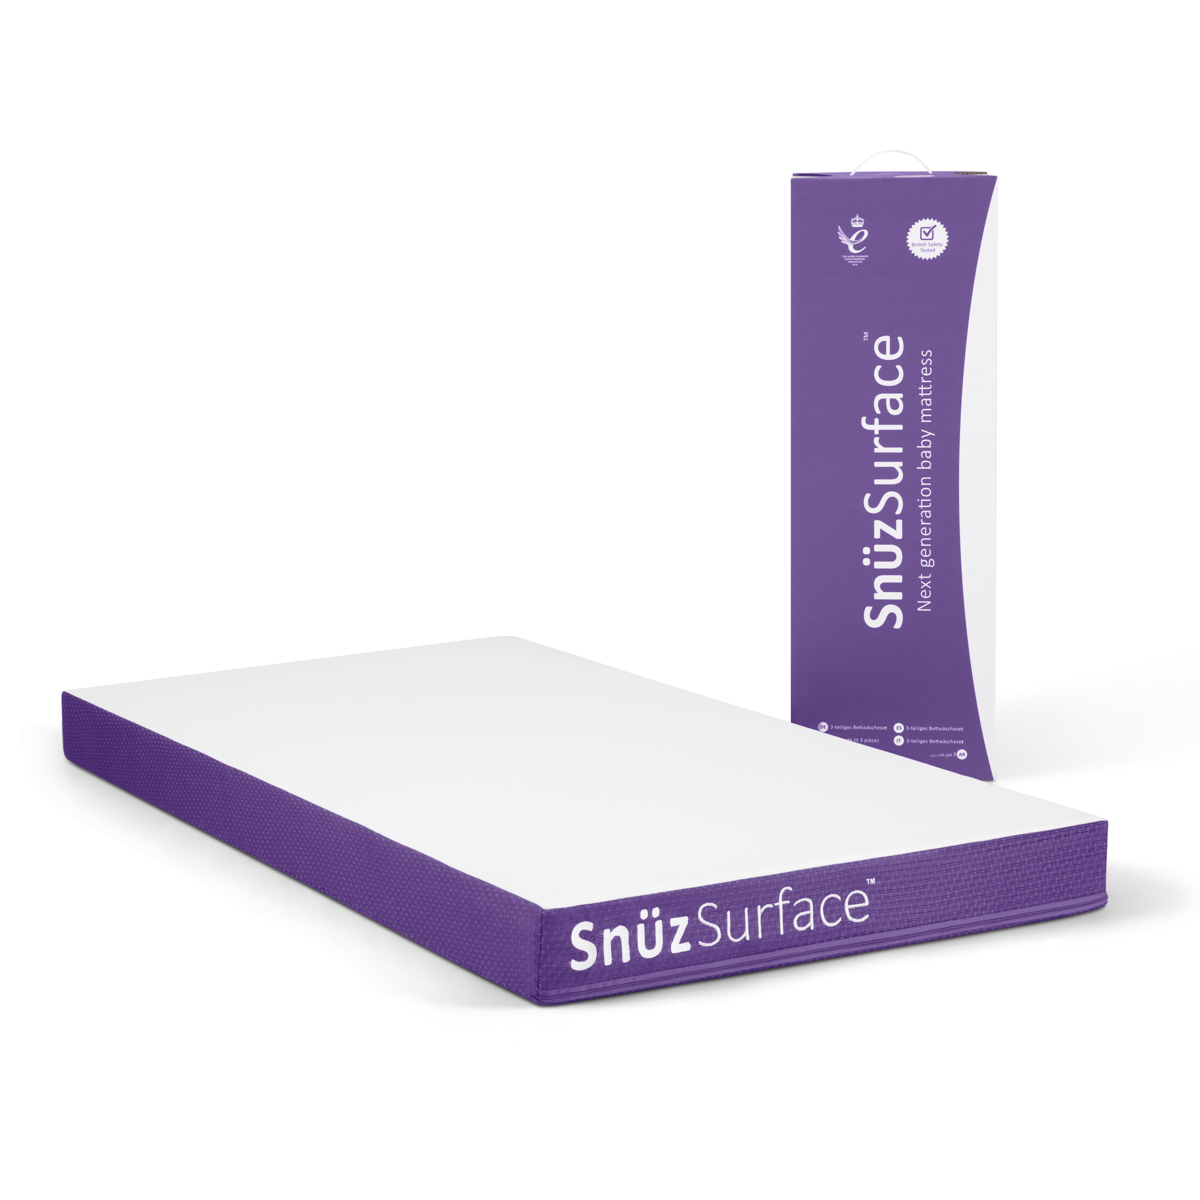 SnuzSurface Adaptable Cot Bed Mattress - 68 x 117cm (SnuzKot)